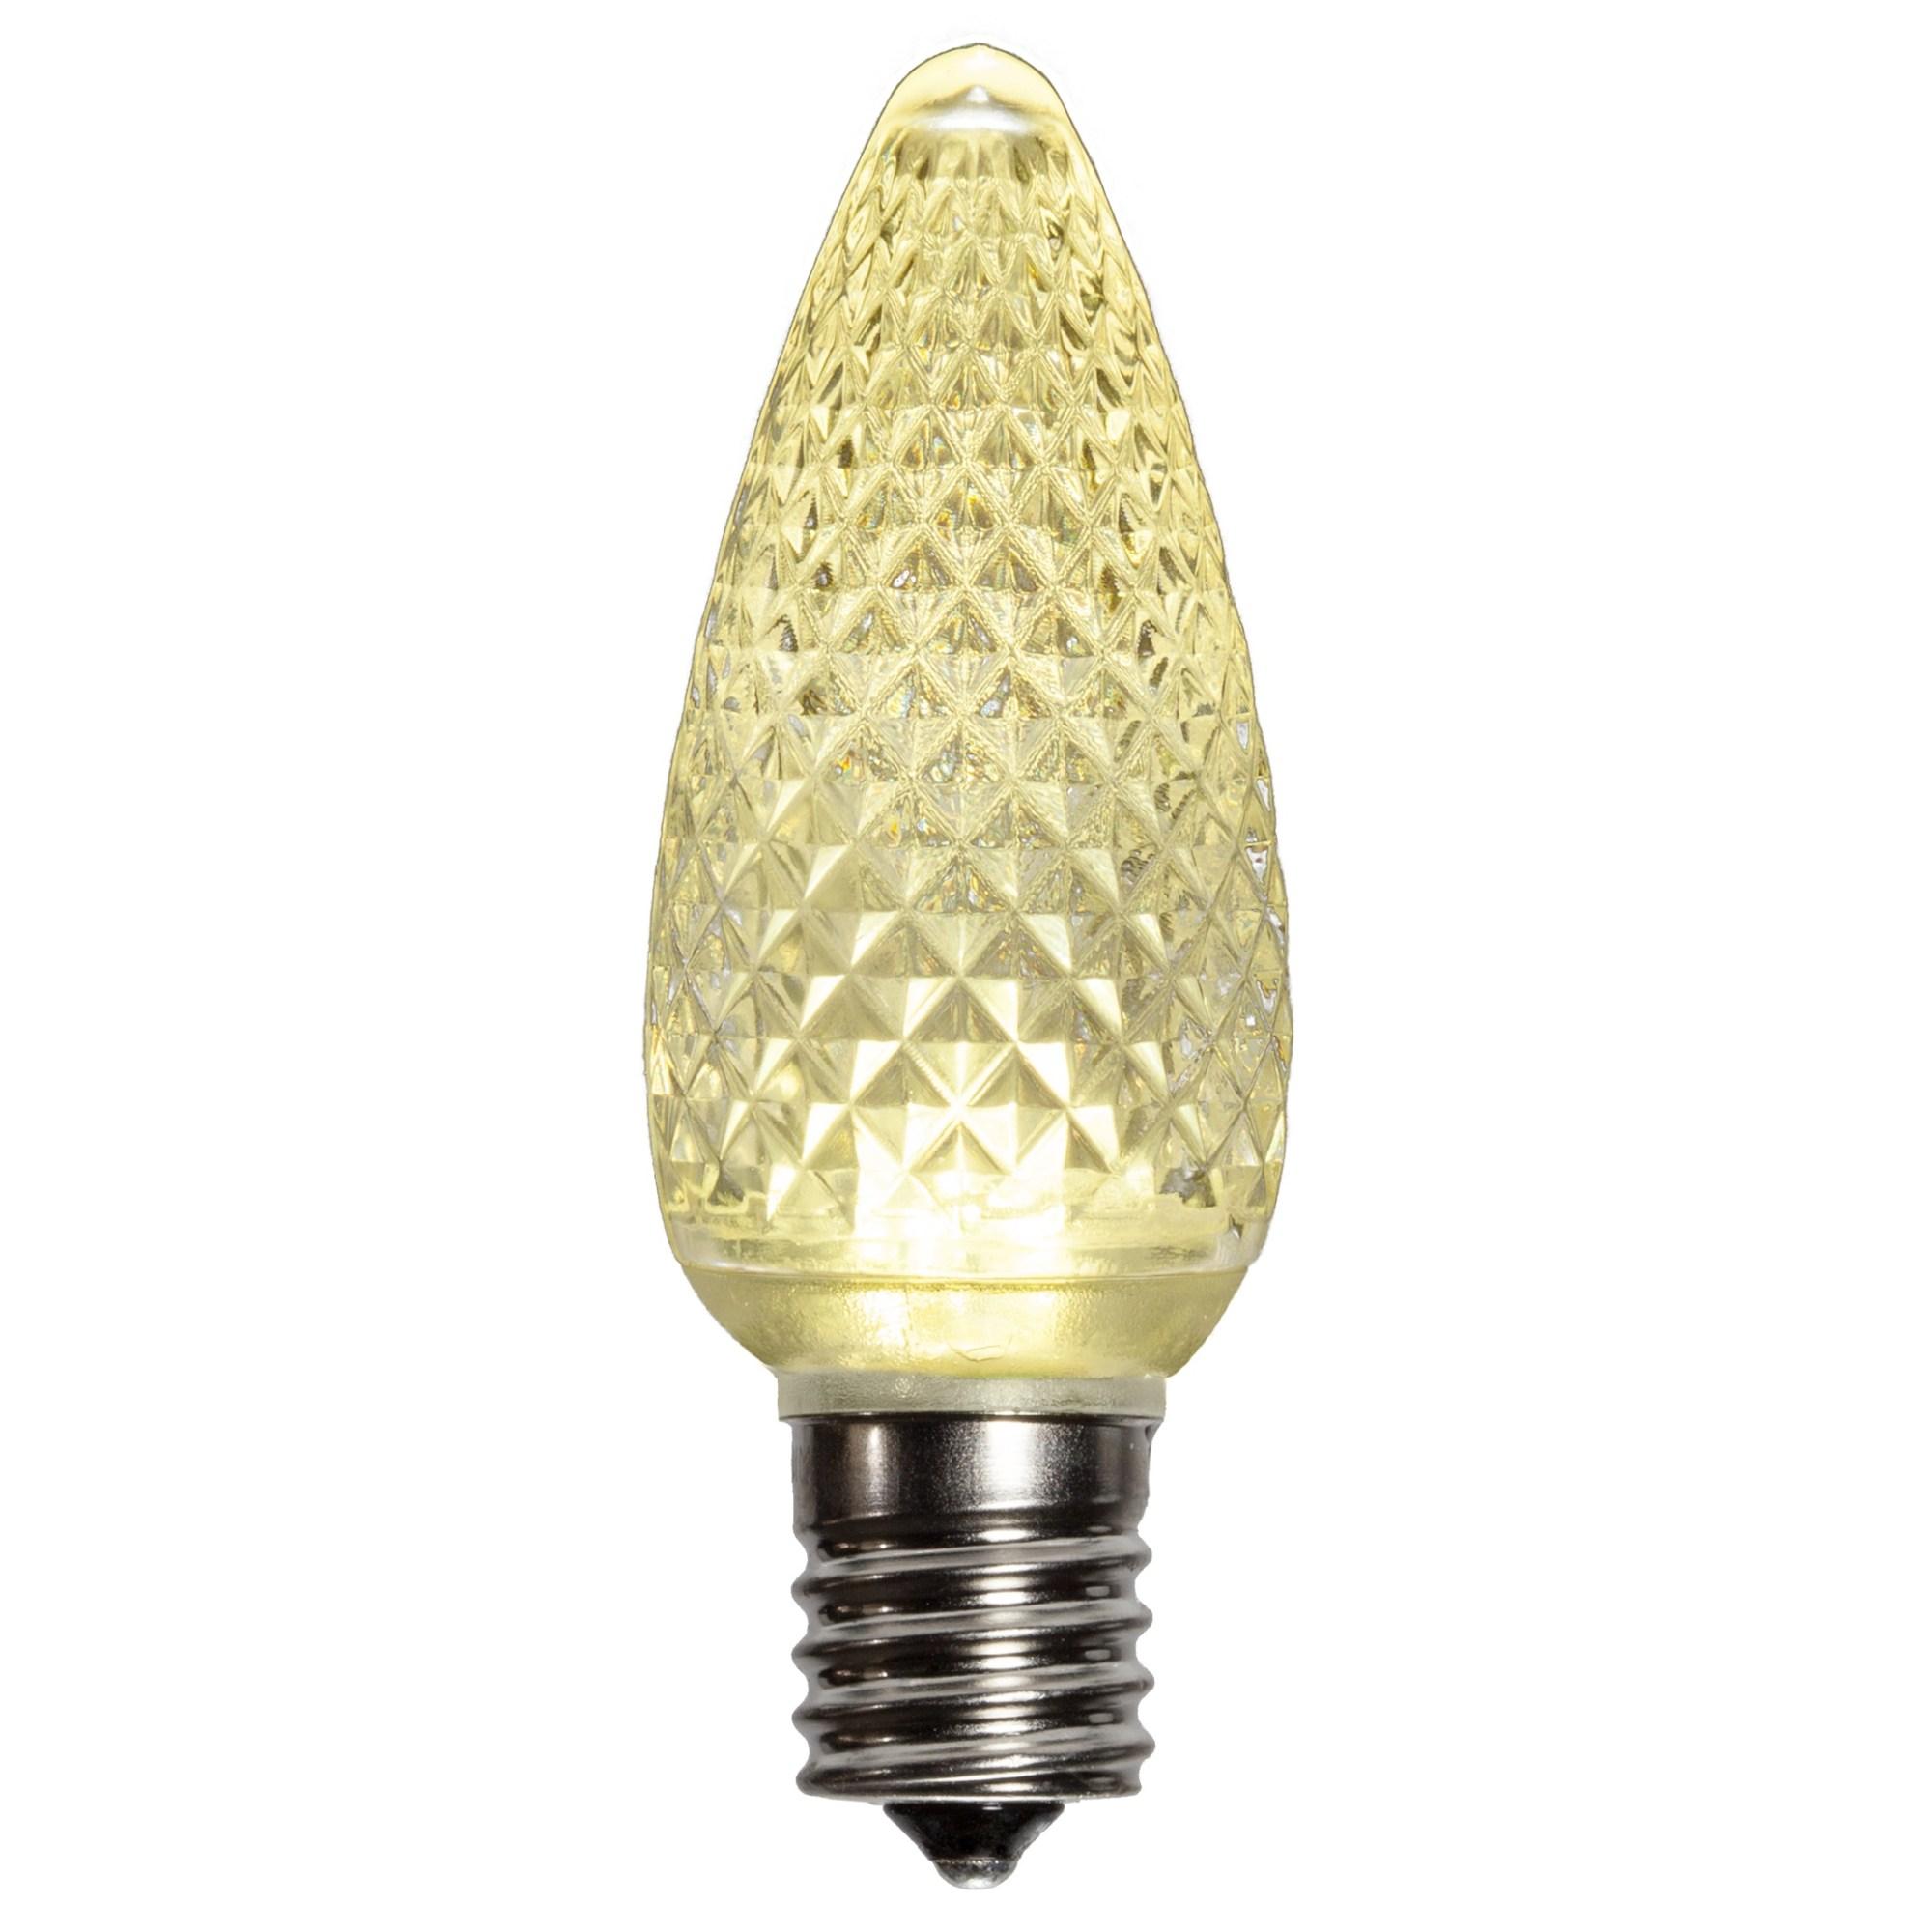 hight resolution of c9 warm white led light bulb